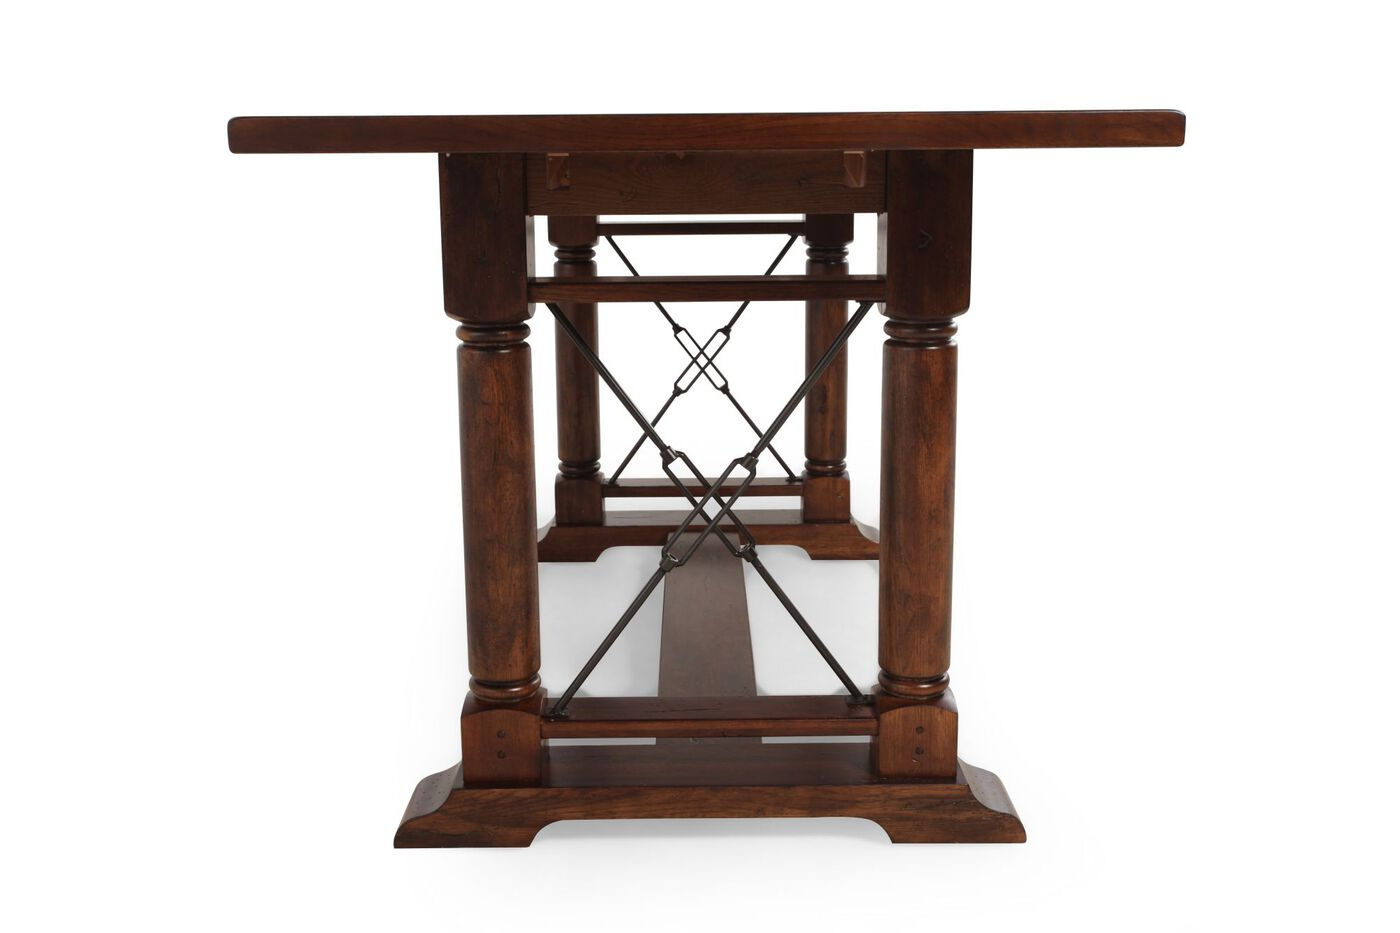 Broyhill Attic Heirlooms Rustic Oak Counter Height Table Mathis - Broyhill counter height dining set